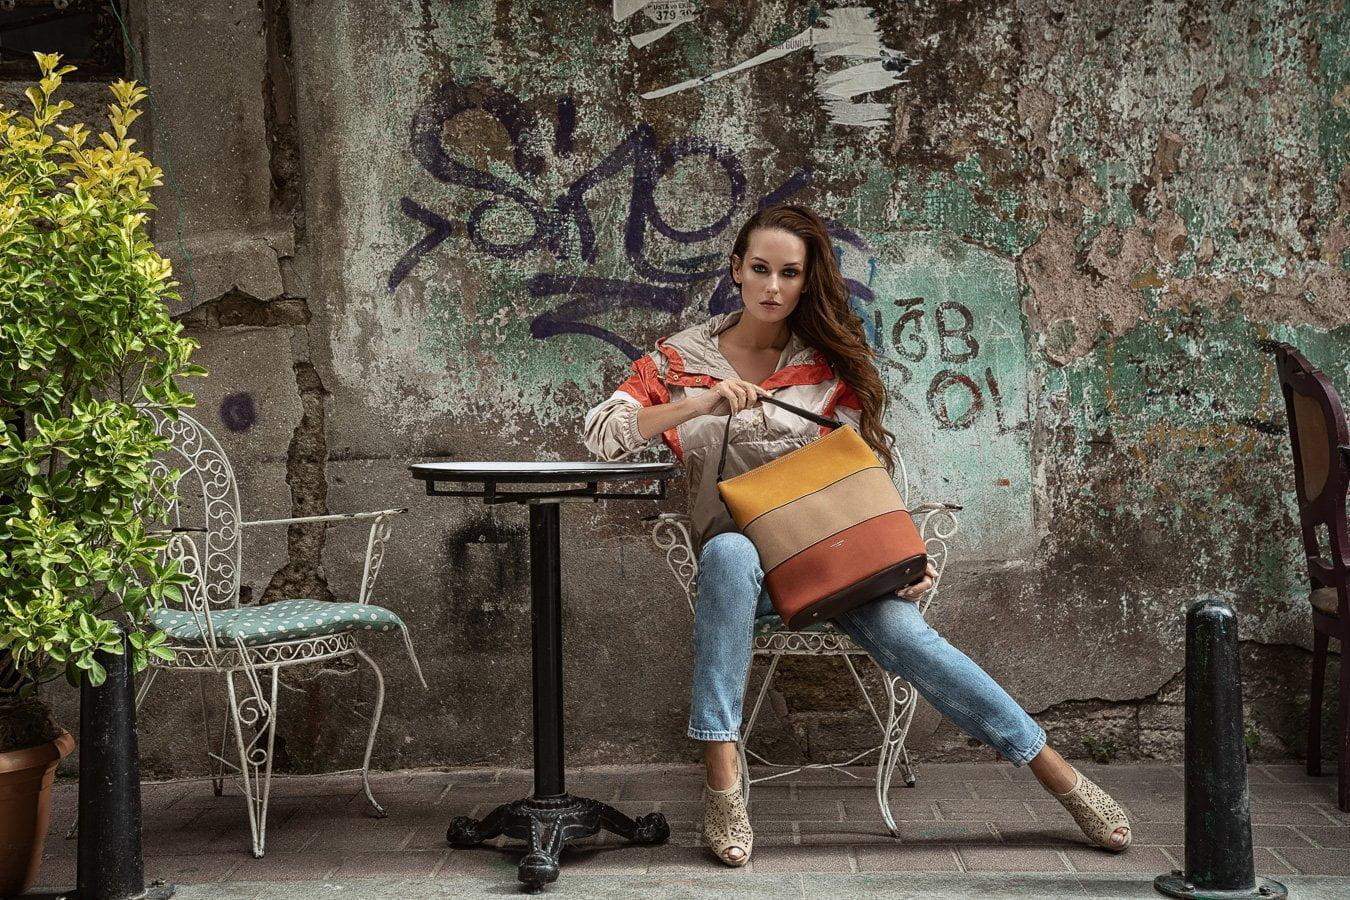 Moda Çekimi - Editorial - Beauty moda tekstil burakbulutfotografatolyesi 7